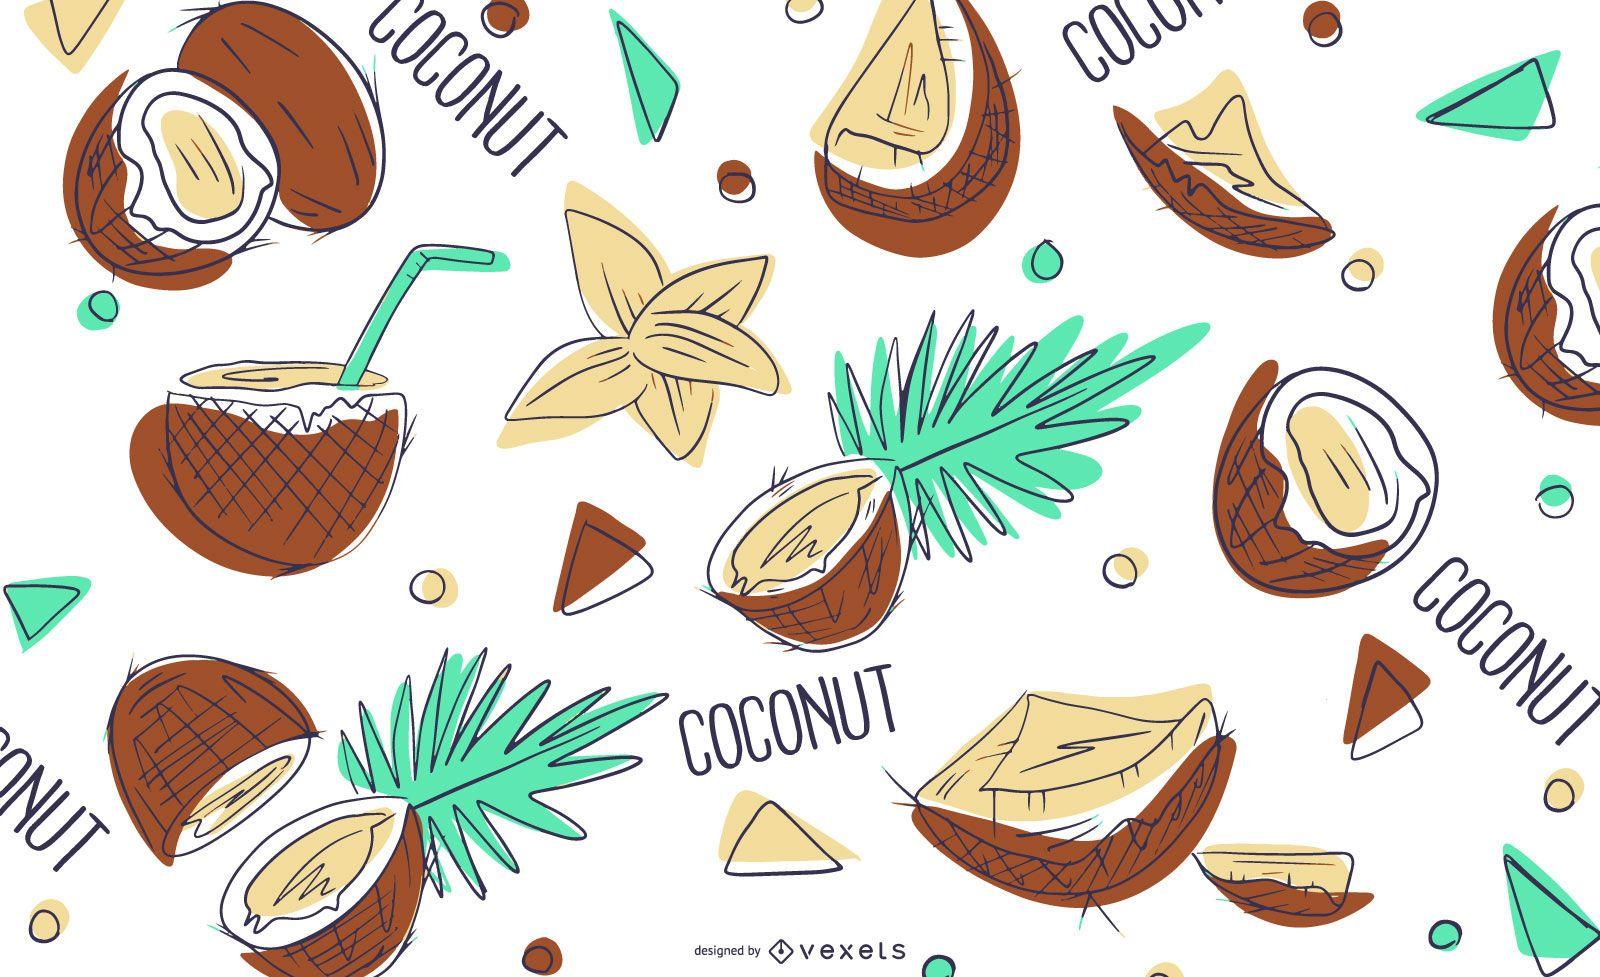 Coconut pattern design